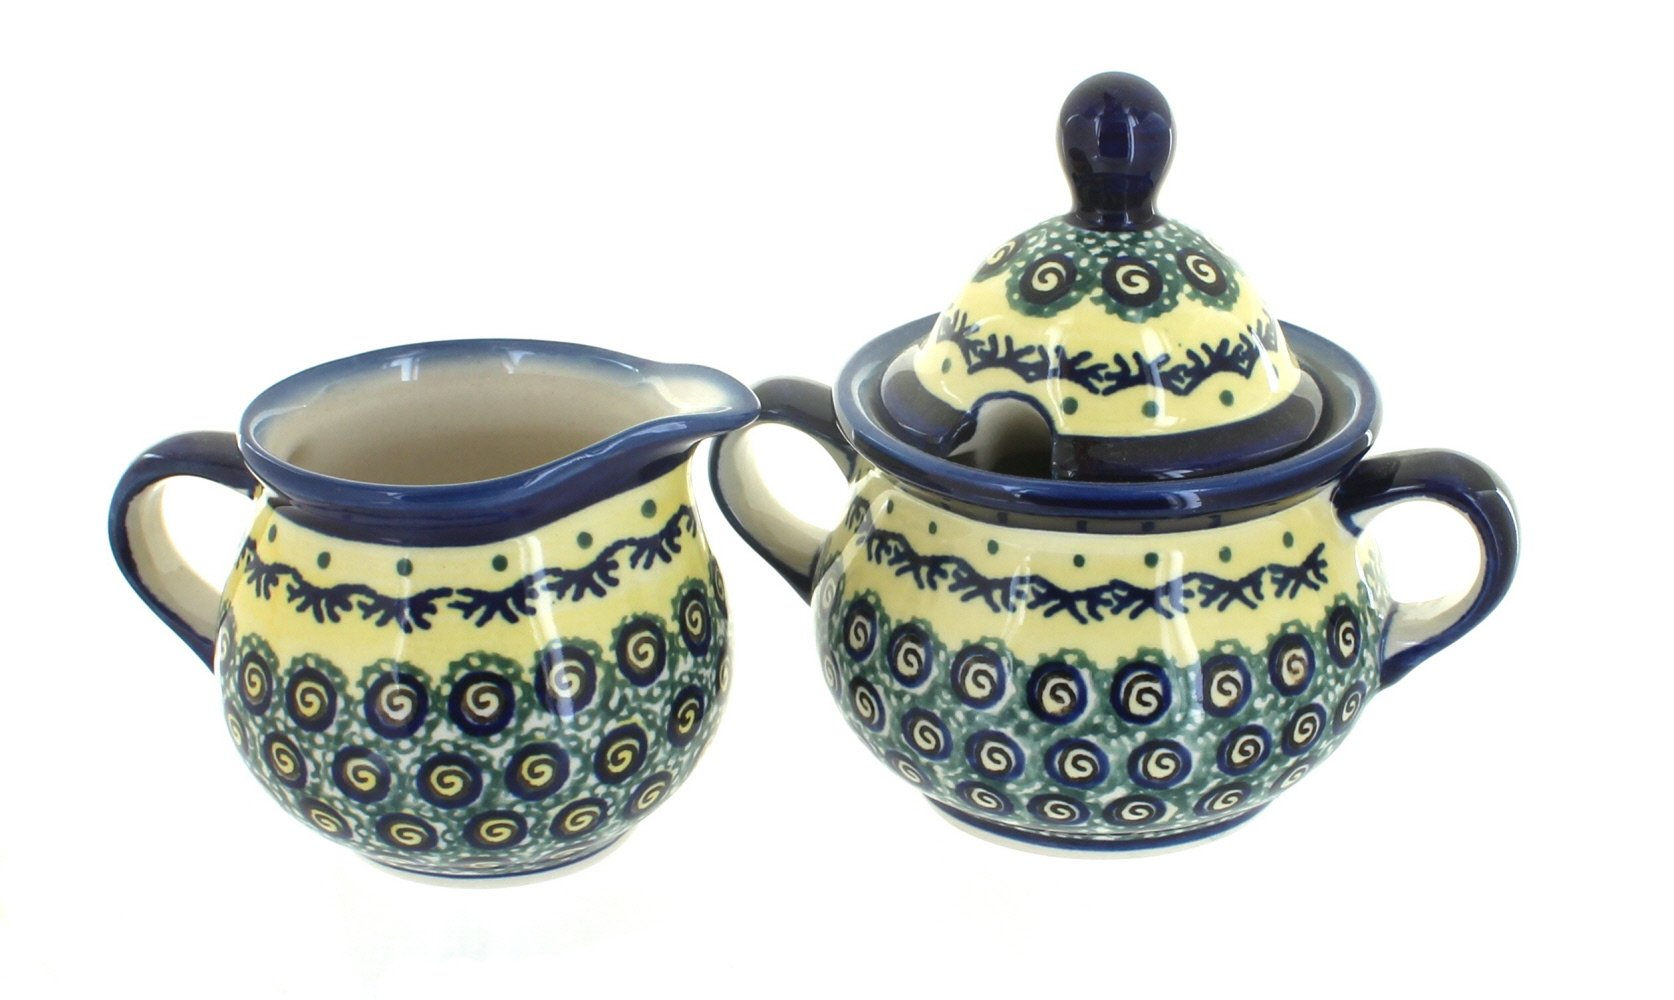 Polish pottery renaissance sugar & creamer